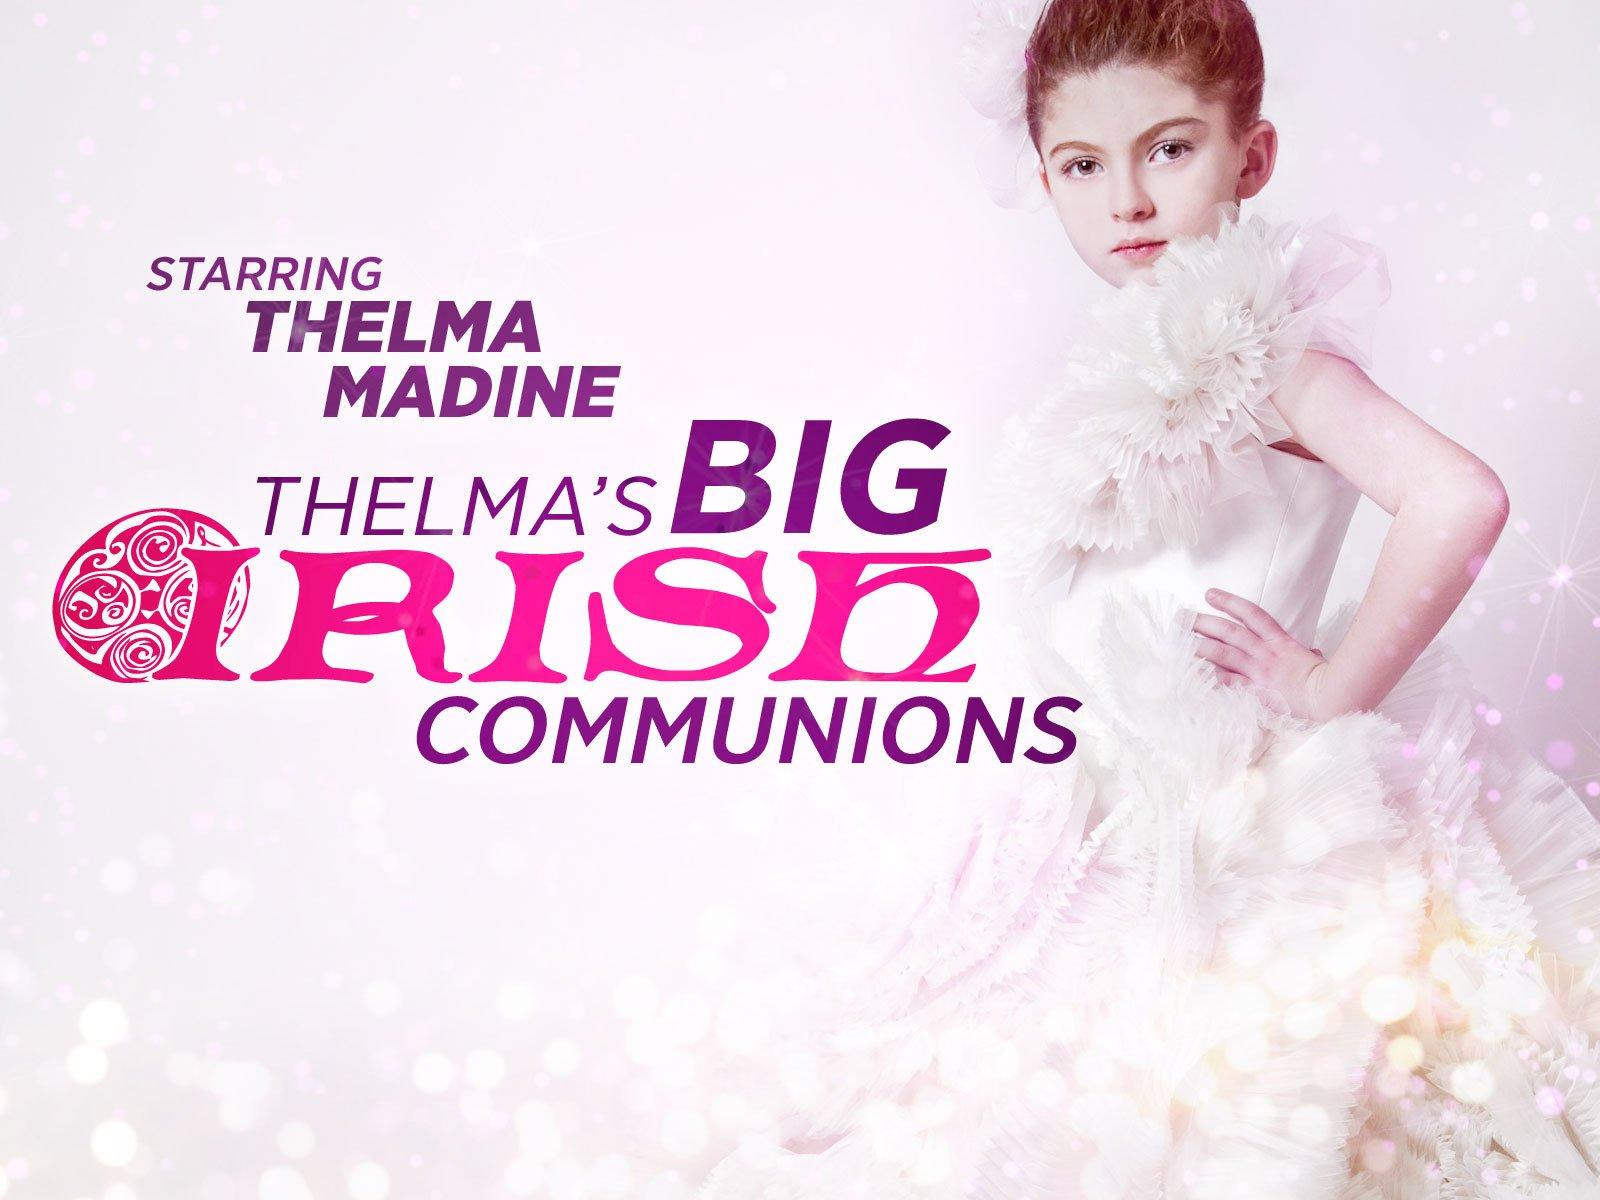 Amazon.com: Thelma\'s Big Irish Communions: Thelma Madine, Banijay